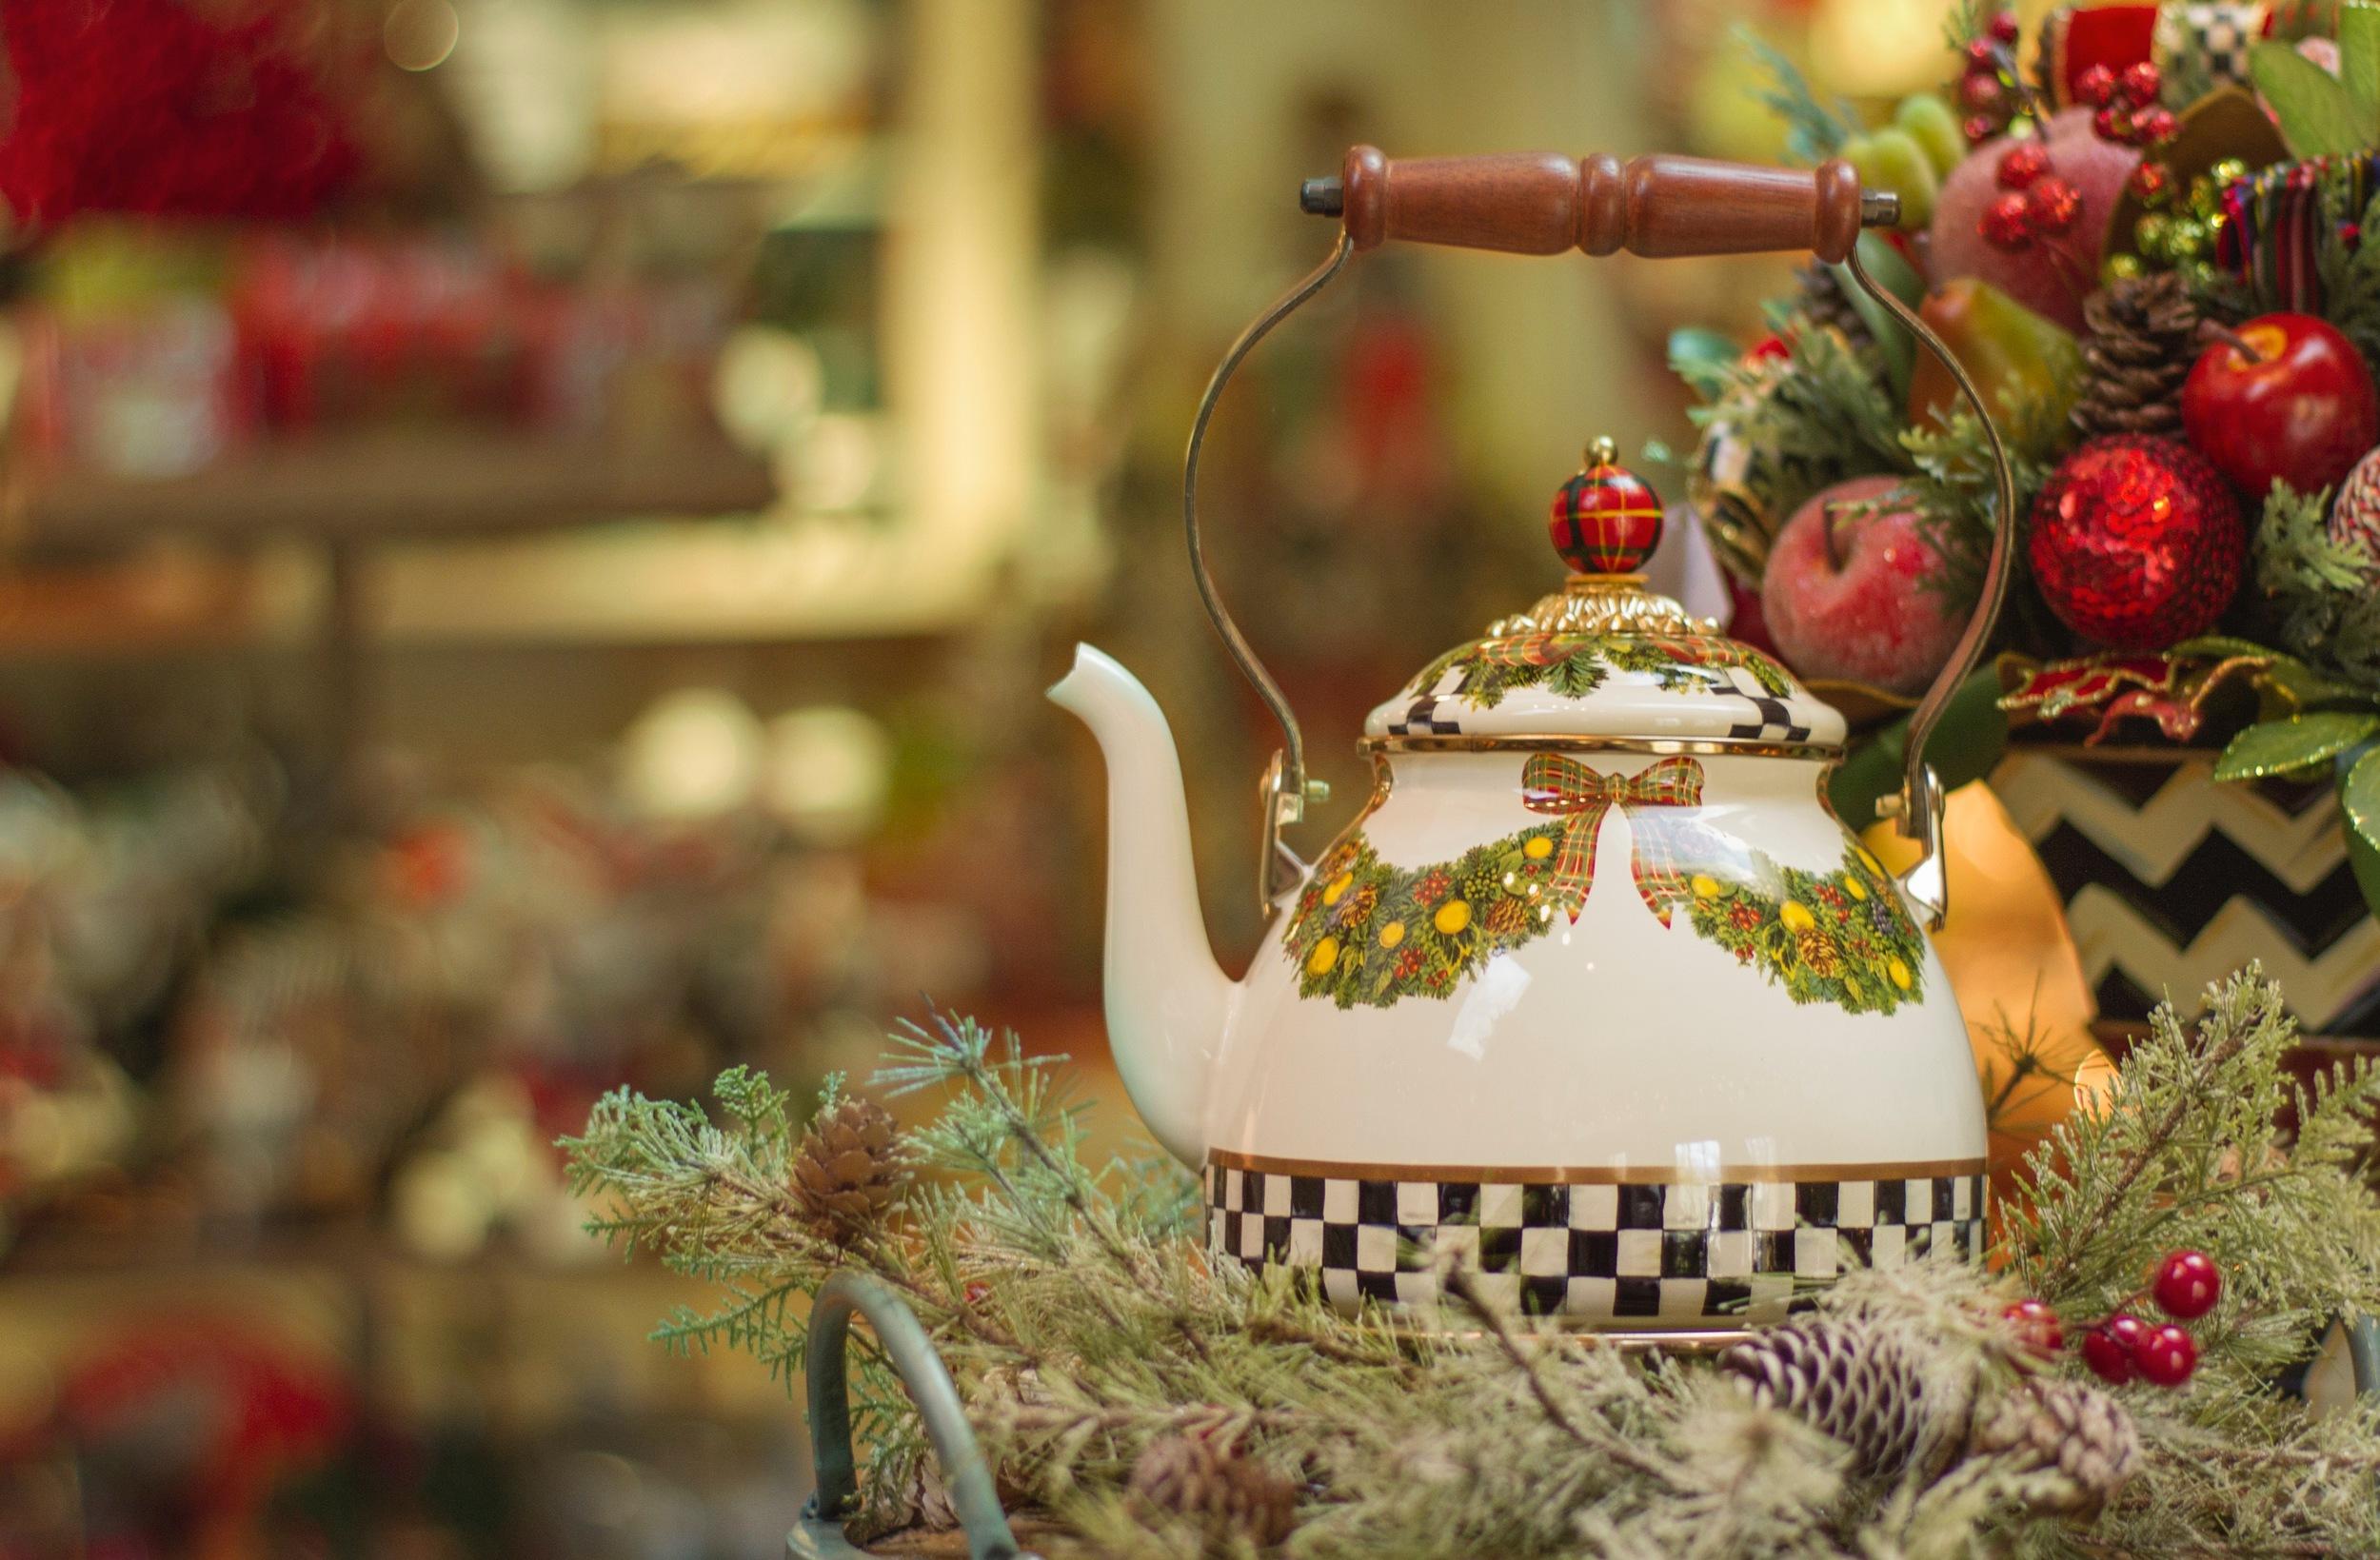 fhbc-kitchen-teapot001.jpg